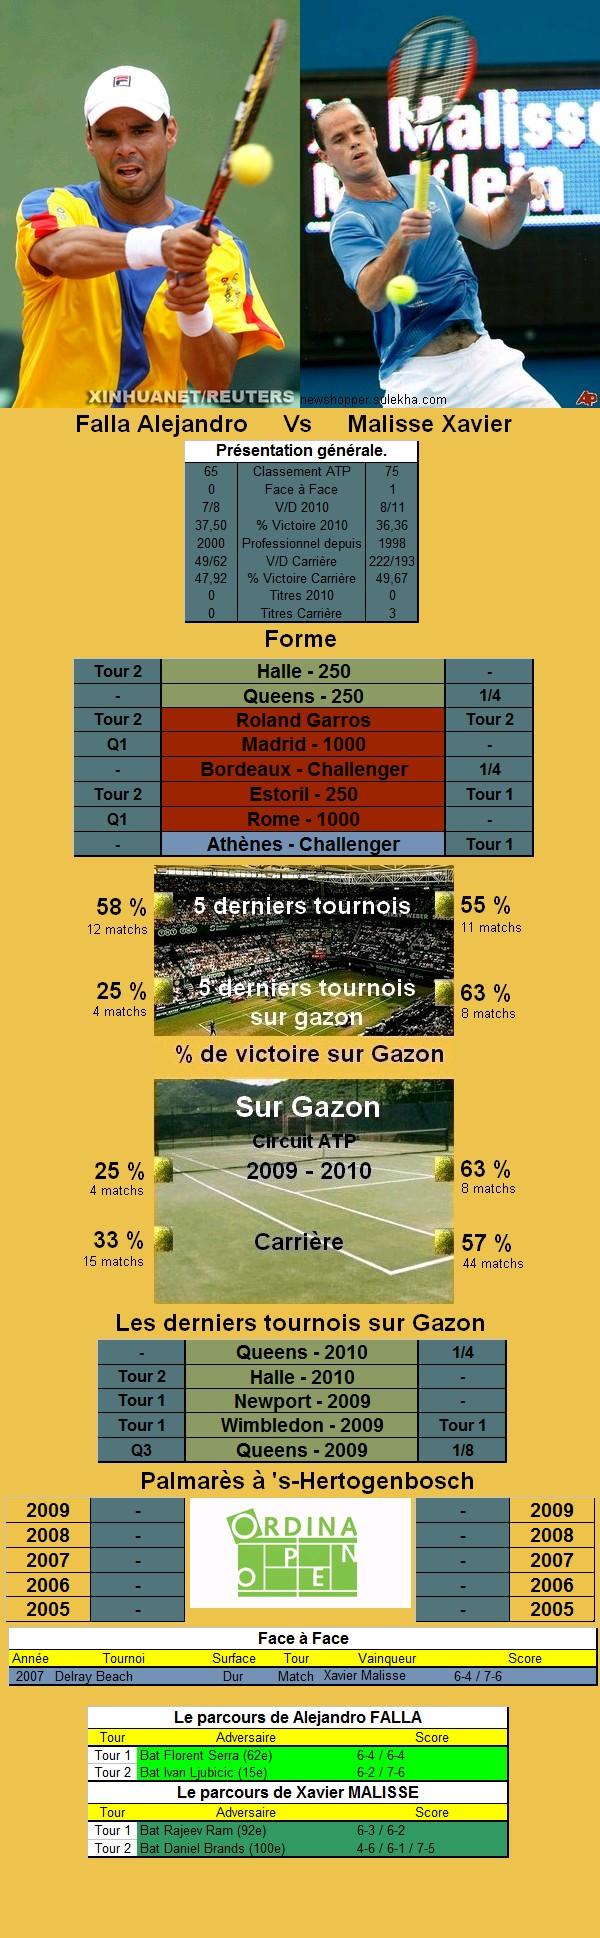 Statistiques tennis de Falla contre Malisse à s'hertogenbosch